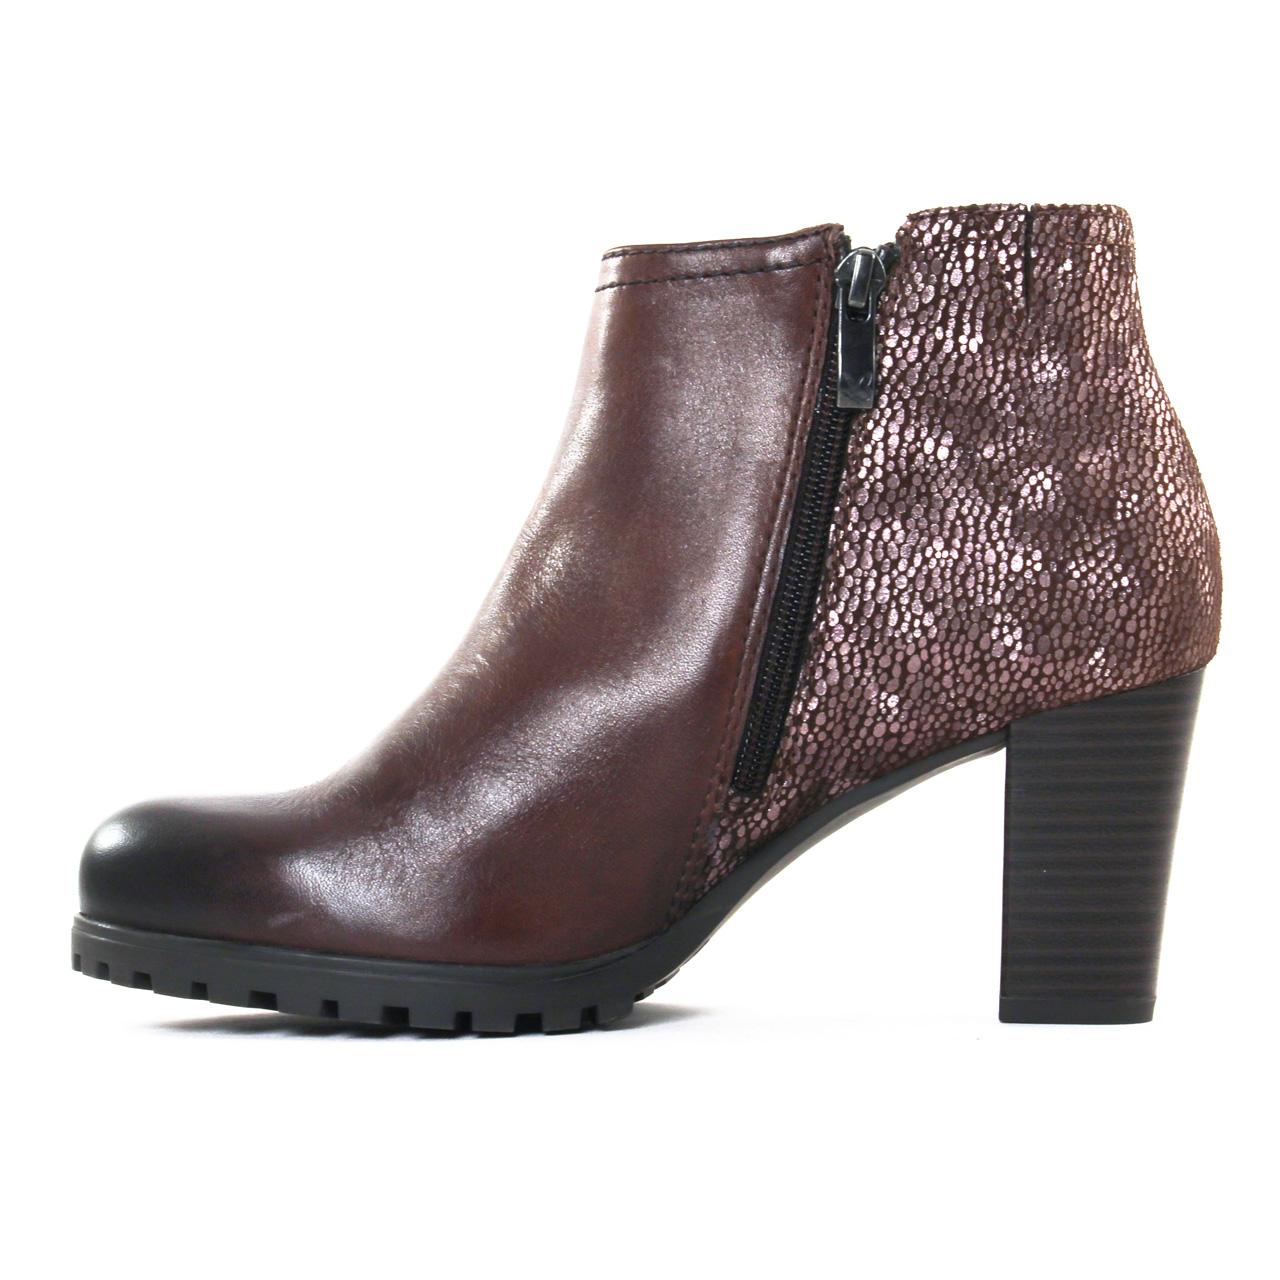 Caprice Boots talon Marron Marron - Chaussures Bottine Femme